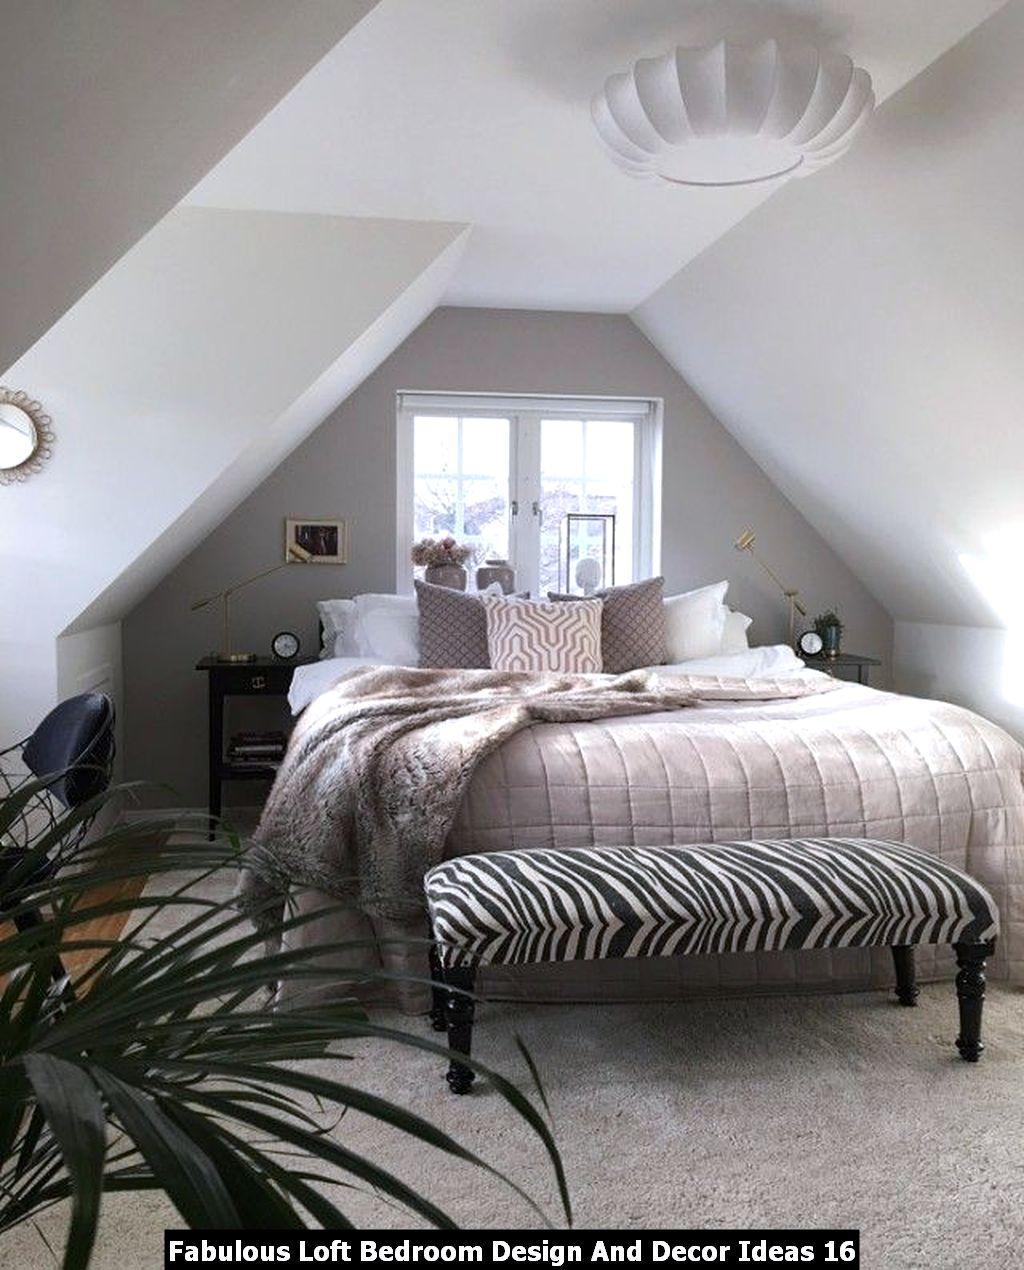 Fabulous Loft Bedroom Design And Decor Ideas 16